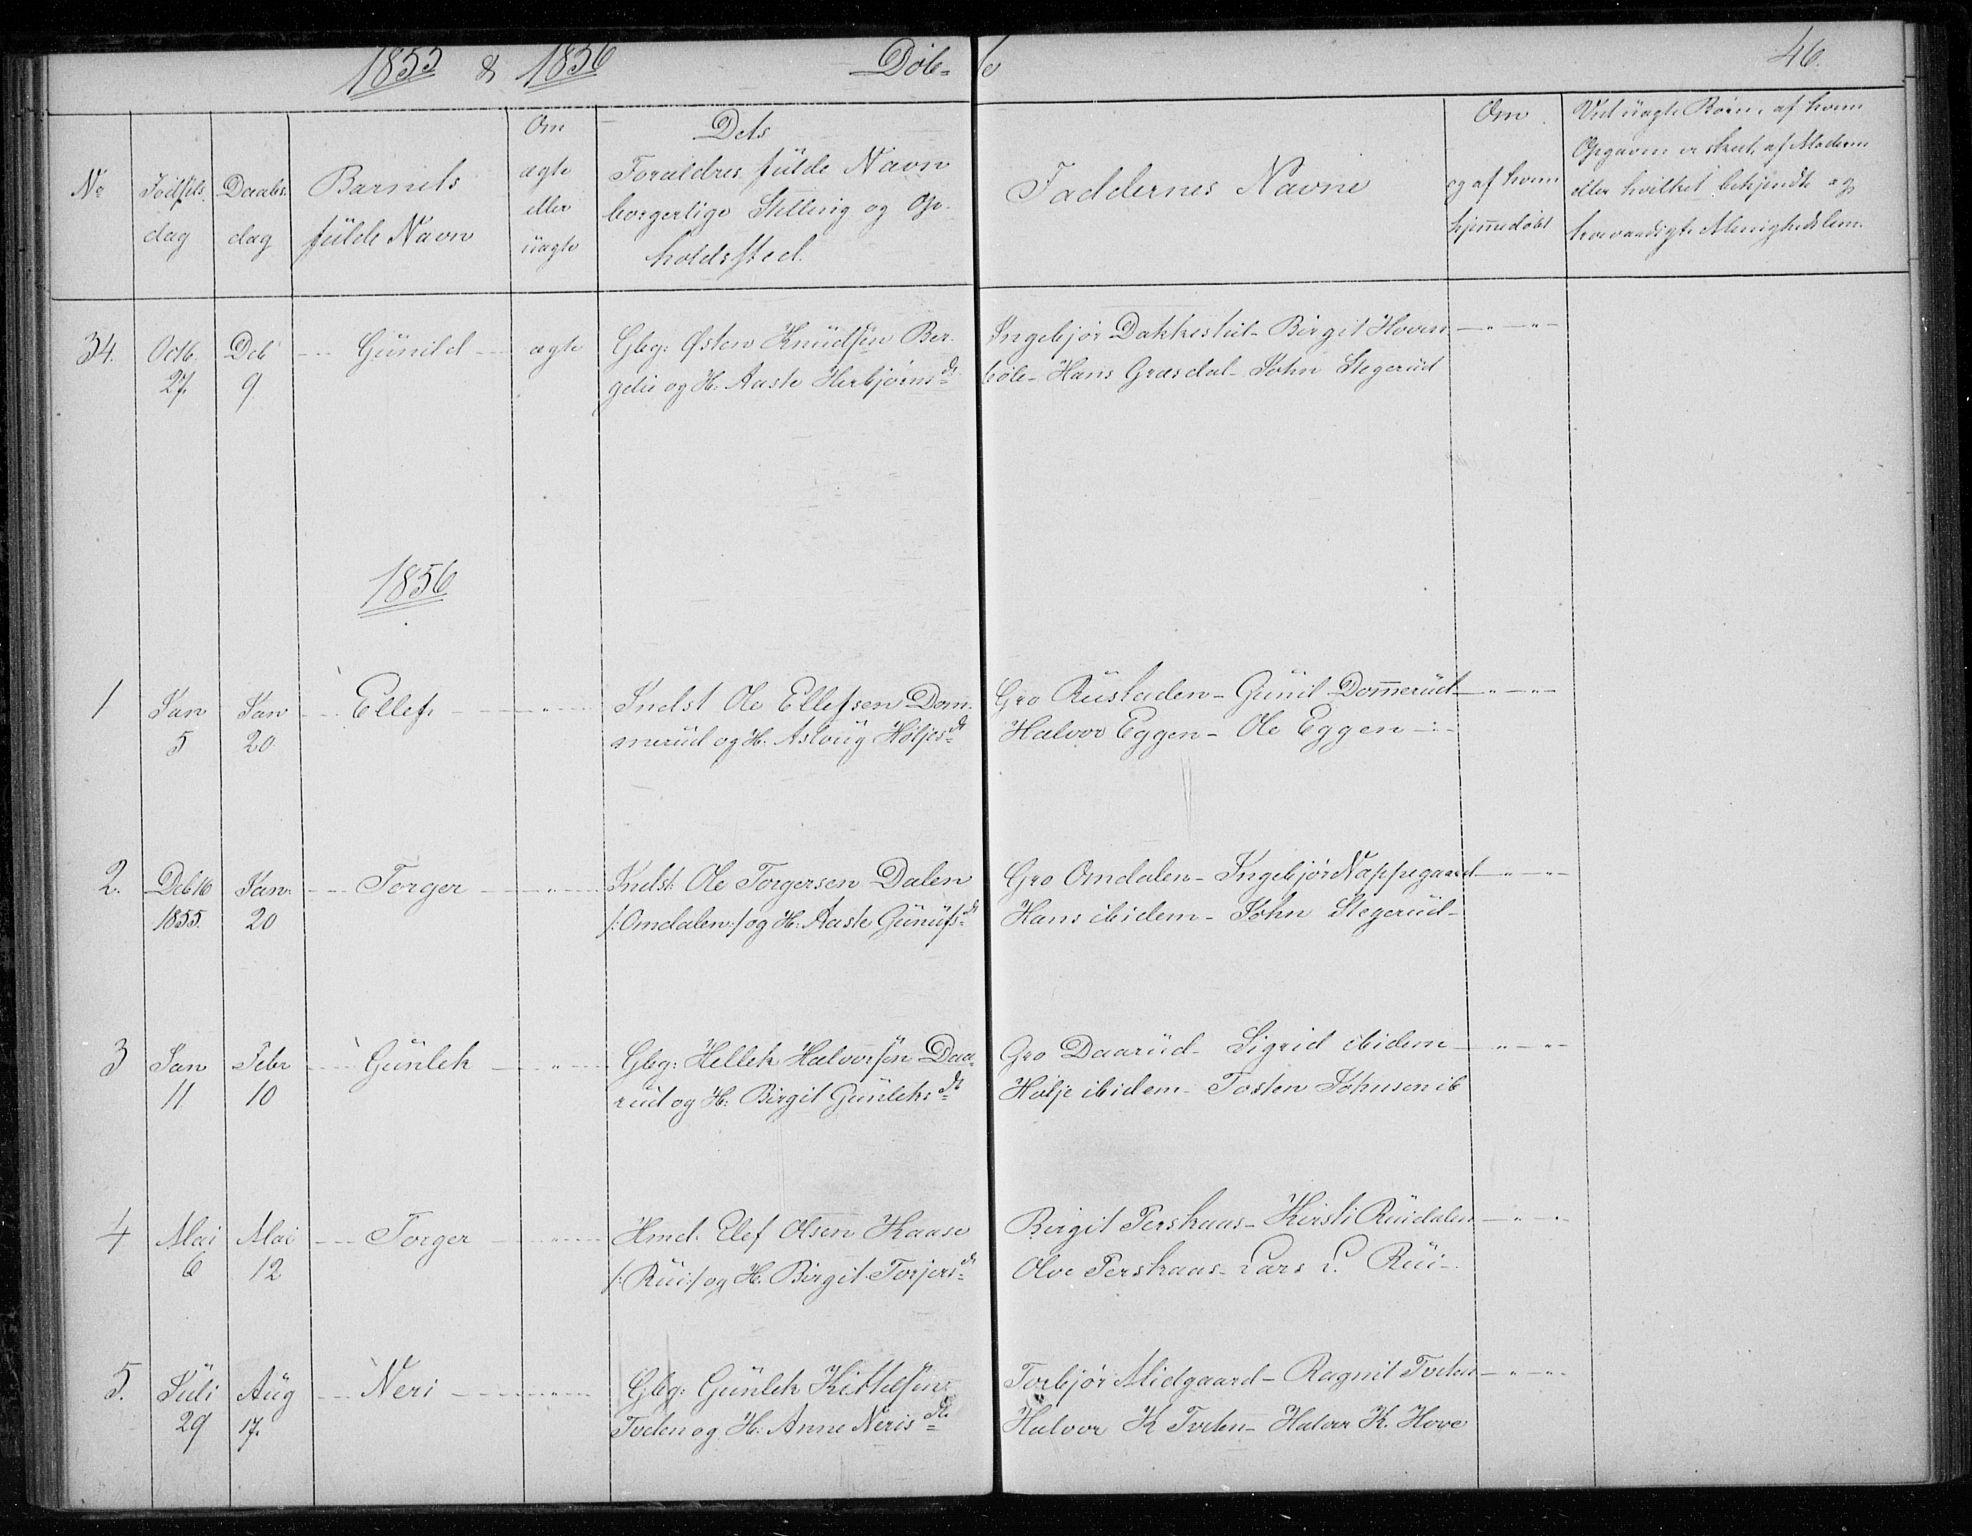 SAKO, Gransherad kirkebøker, F/Fb/L0003: Ministerialbok nr. II 3, 1844-1859, s. 46